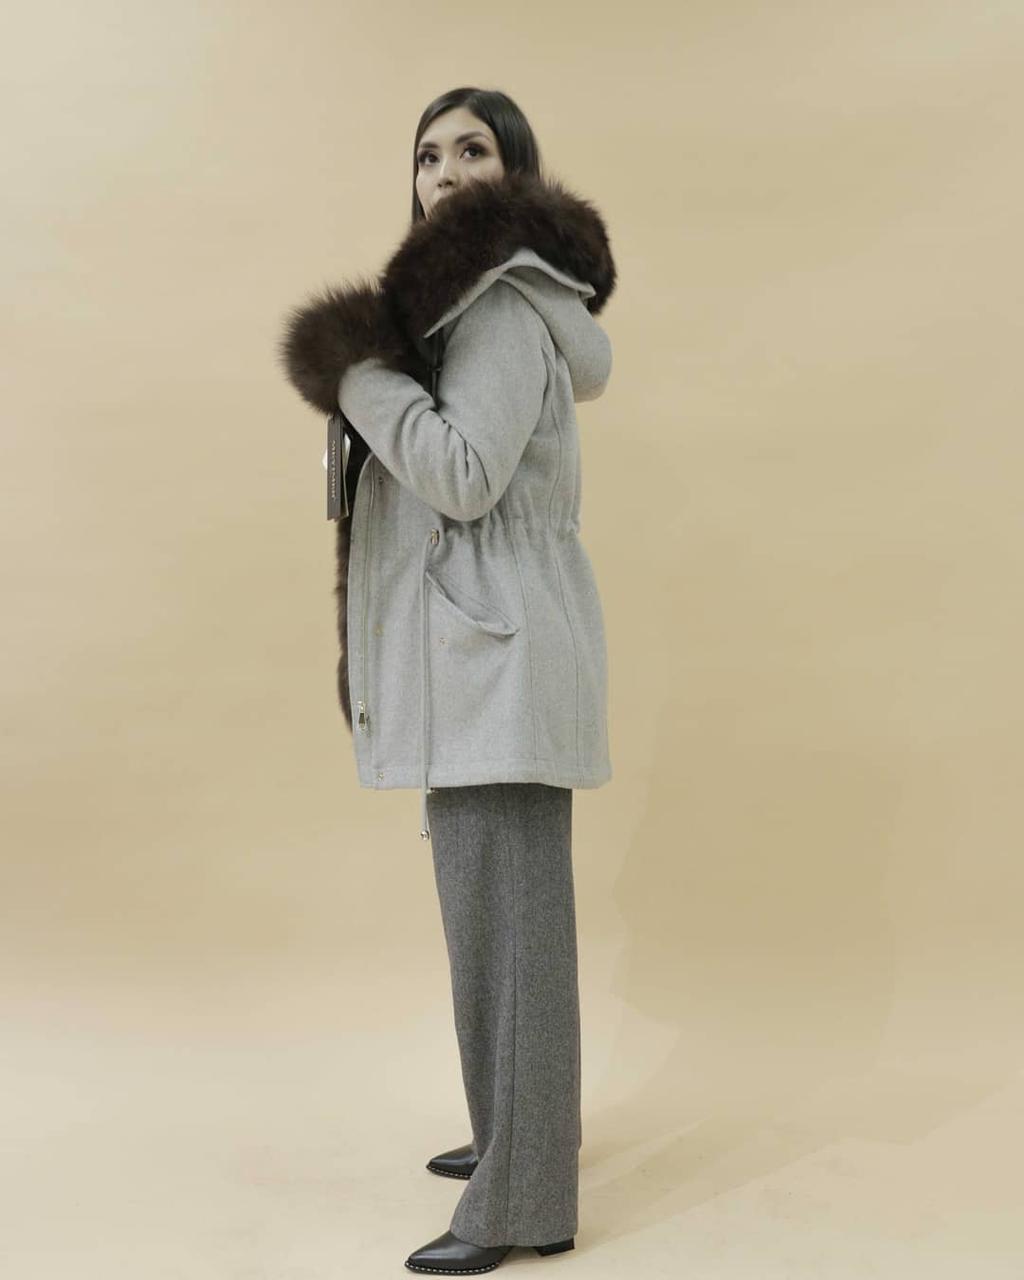 Женская пальто-парка (куница) - фото 1